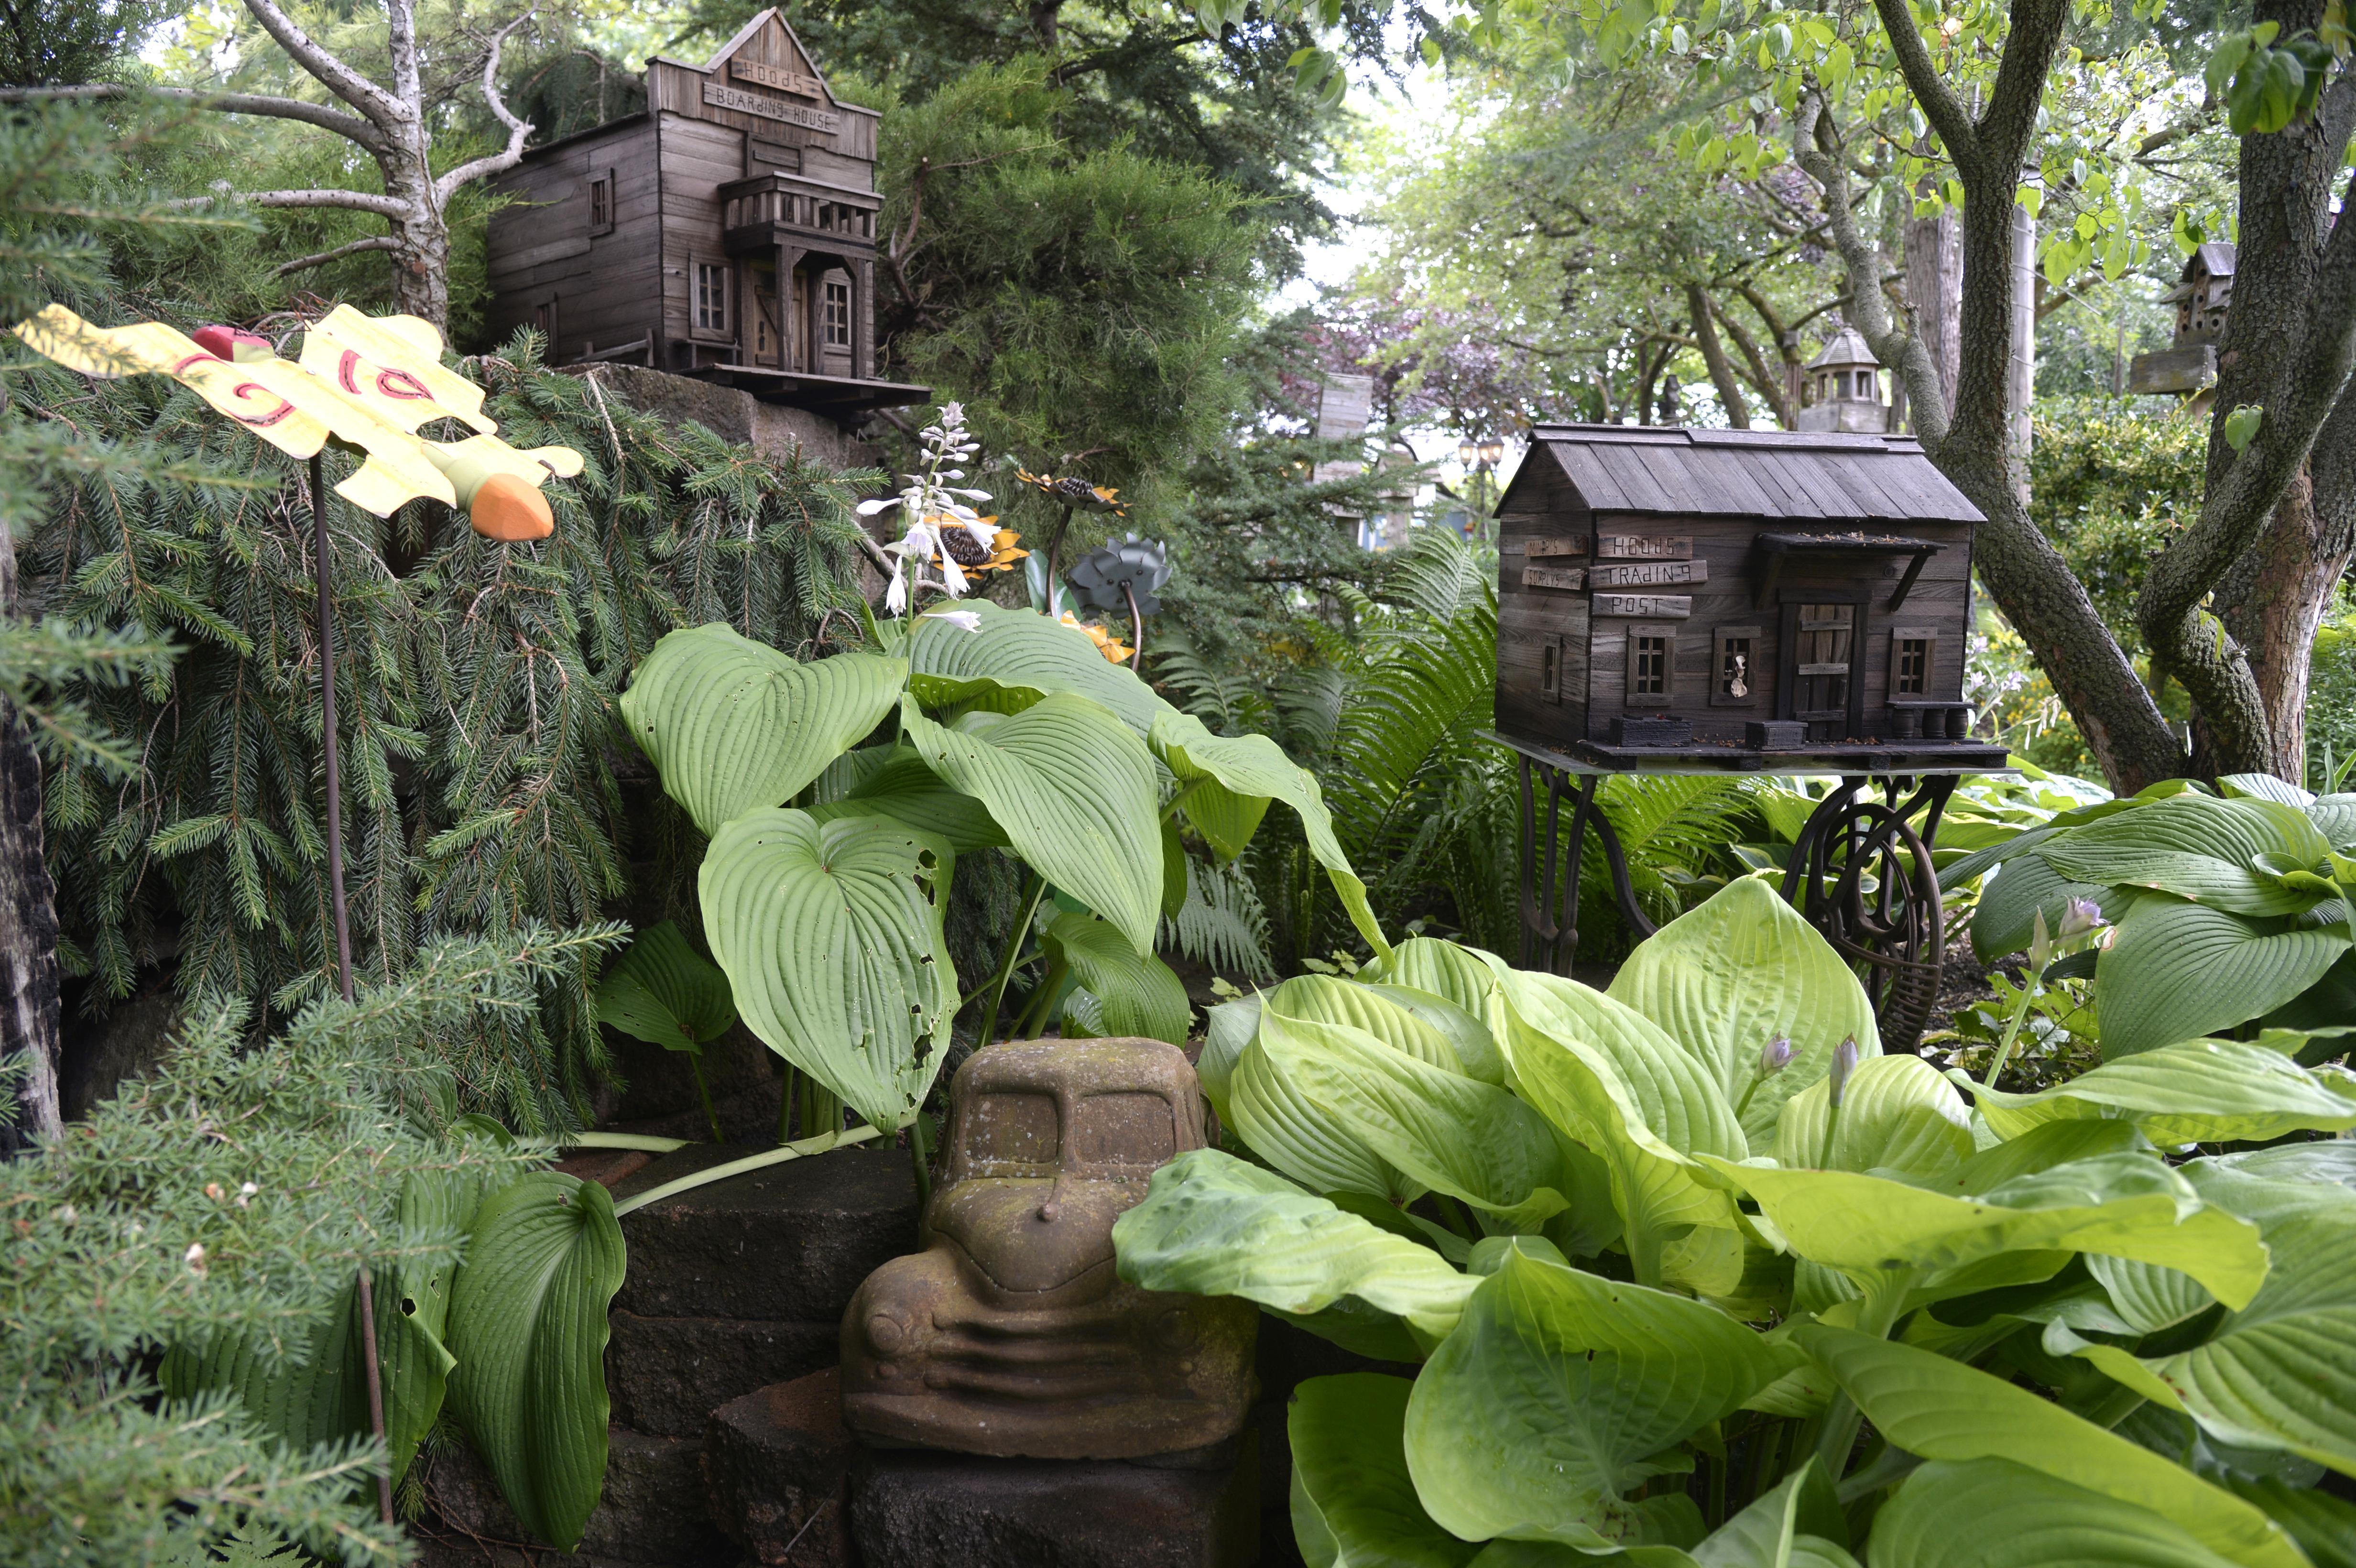 Cda Garden Tour Invites Visitors Into Whimsical World Of Dalton Gardens Property The Spokesman Review